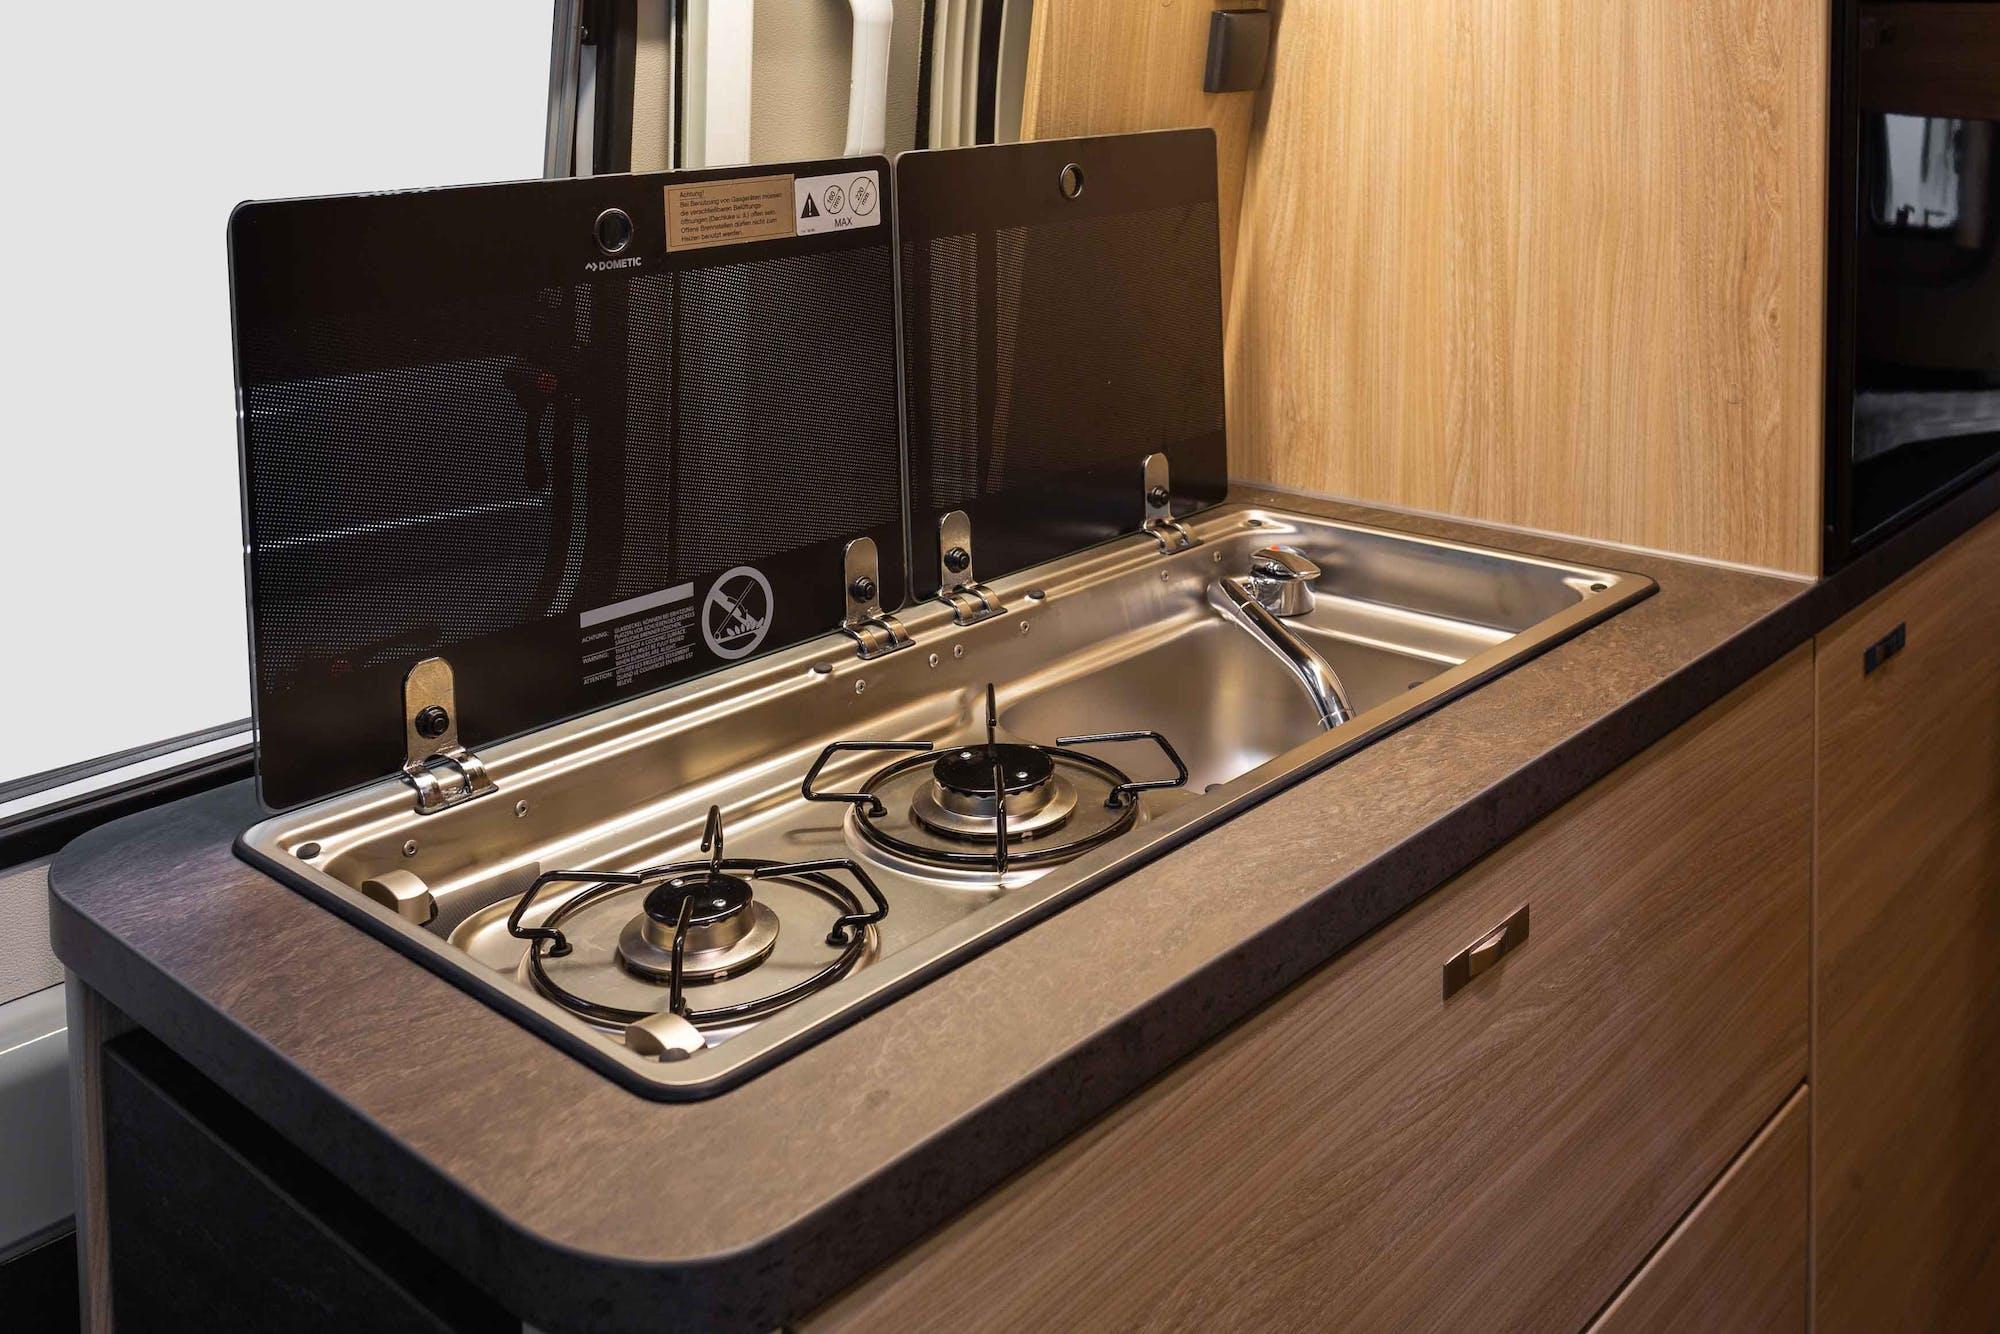 Nomad Model's kitchen